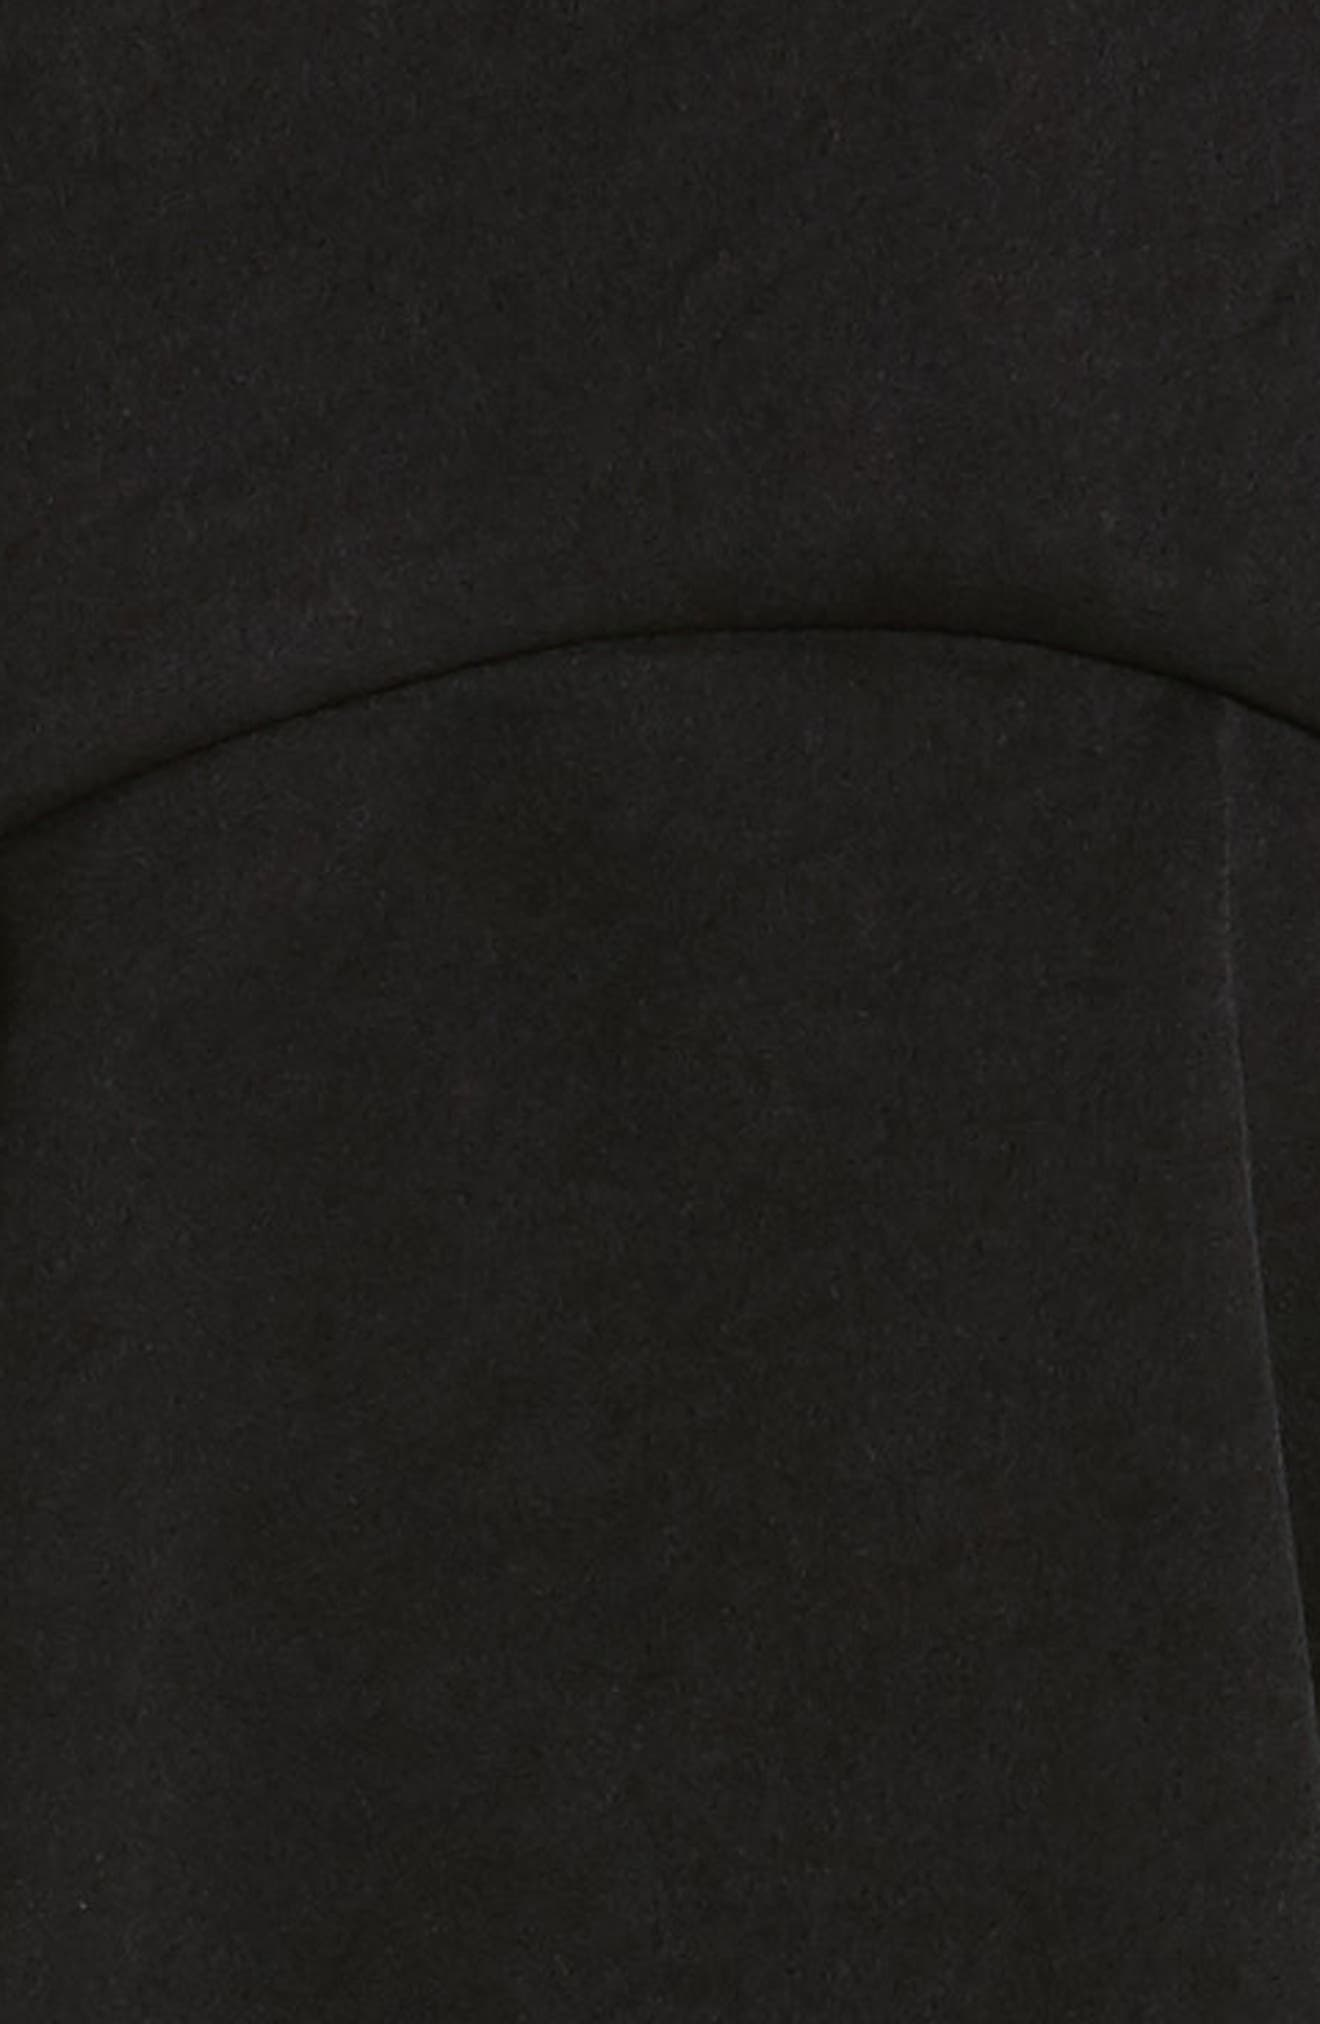 Saloon Ruffle Skirt,                             Alternate thumbnail 5, color,                             001